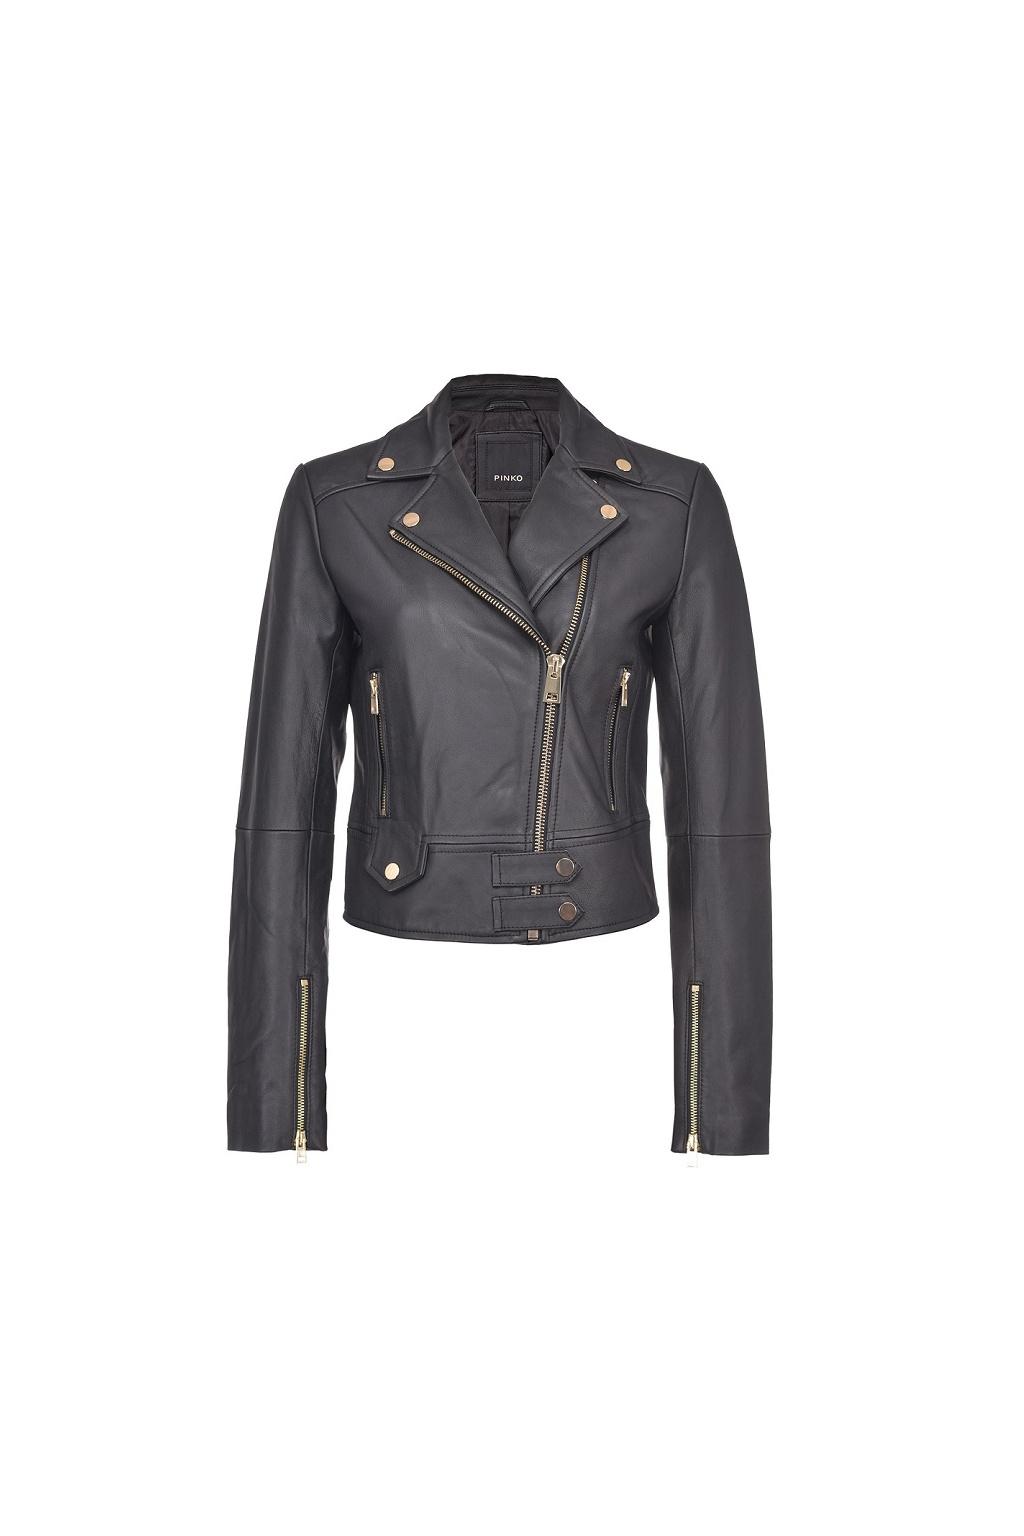 1G15MKY6WL Z99 Dámská kožená bunda Pinko Sensibile 7 černá